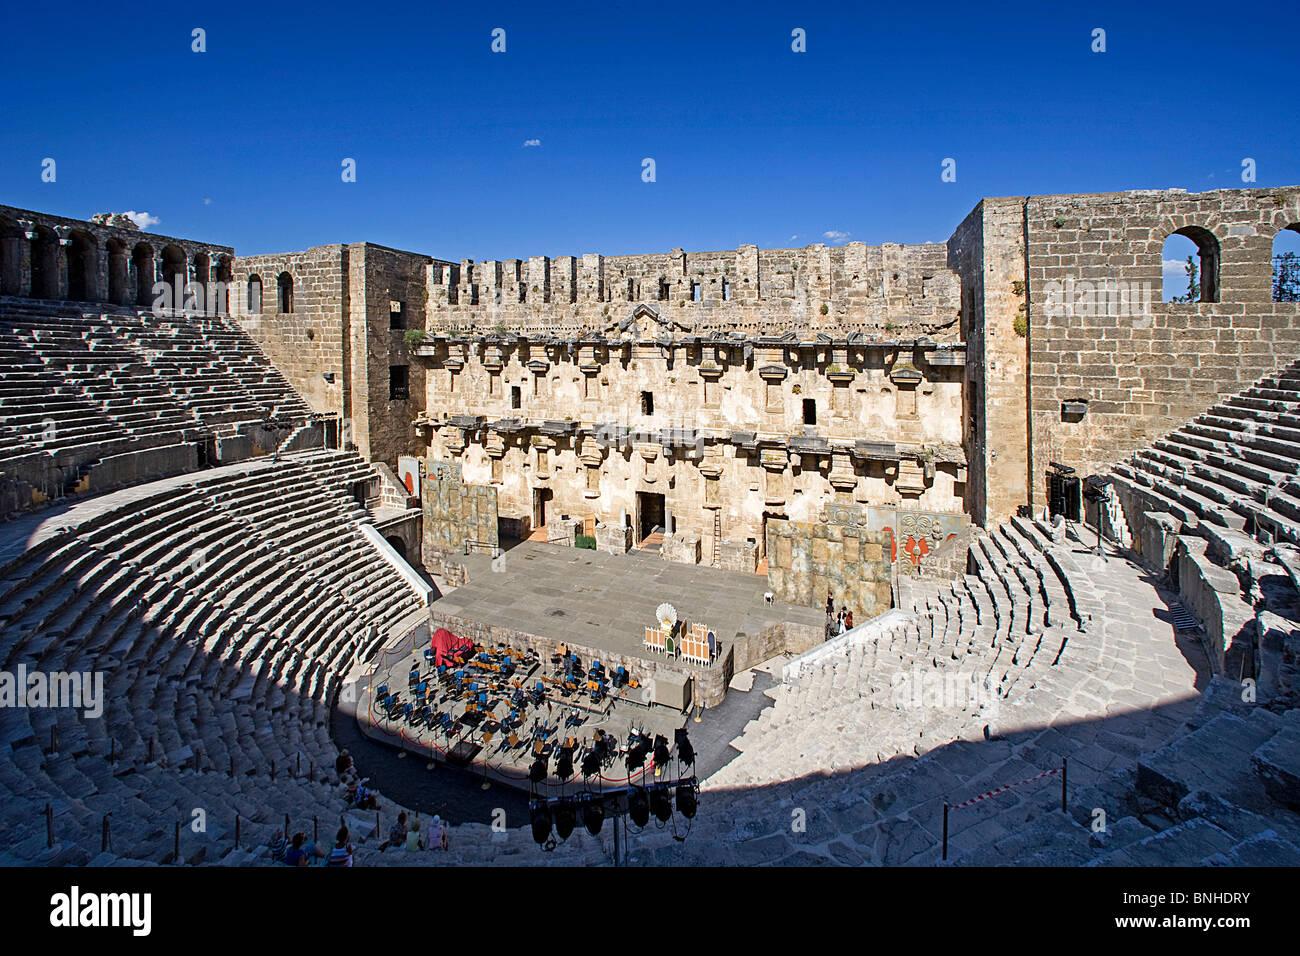 Turkey June 2008 Aspendos city ancient city ancient site historic ruin ruins Roman history Theatre - Stock Image